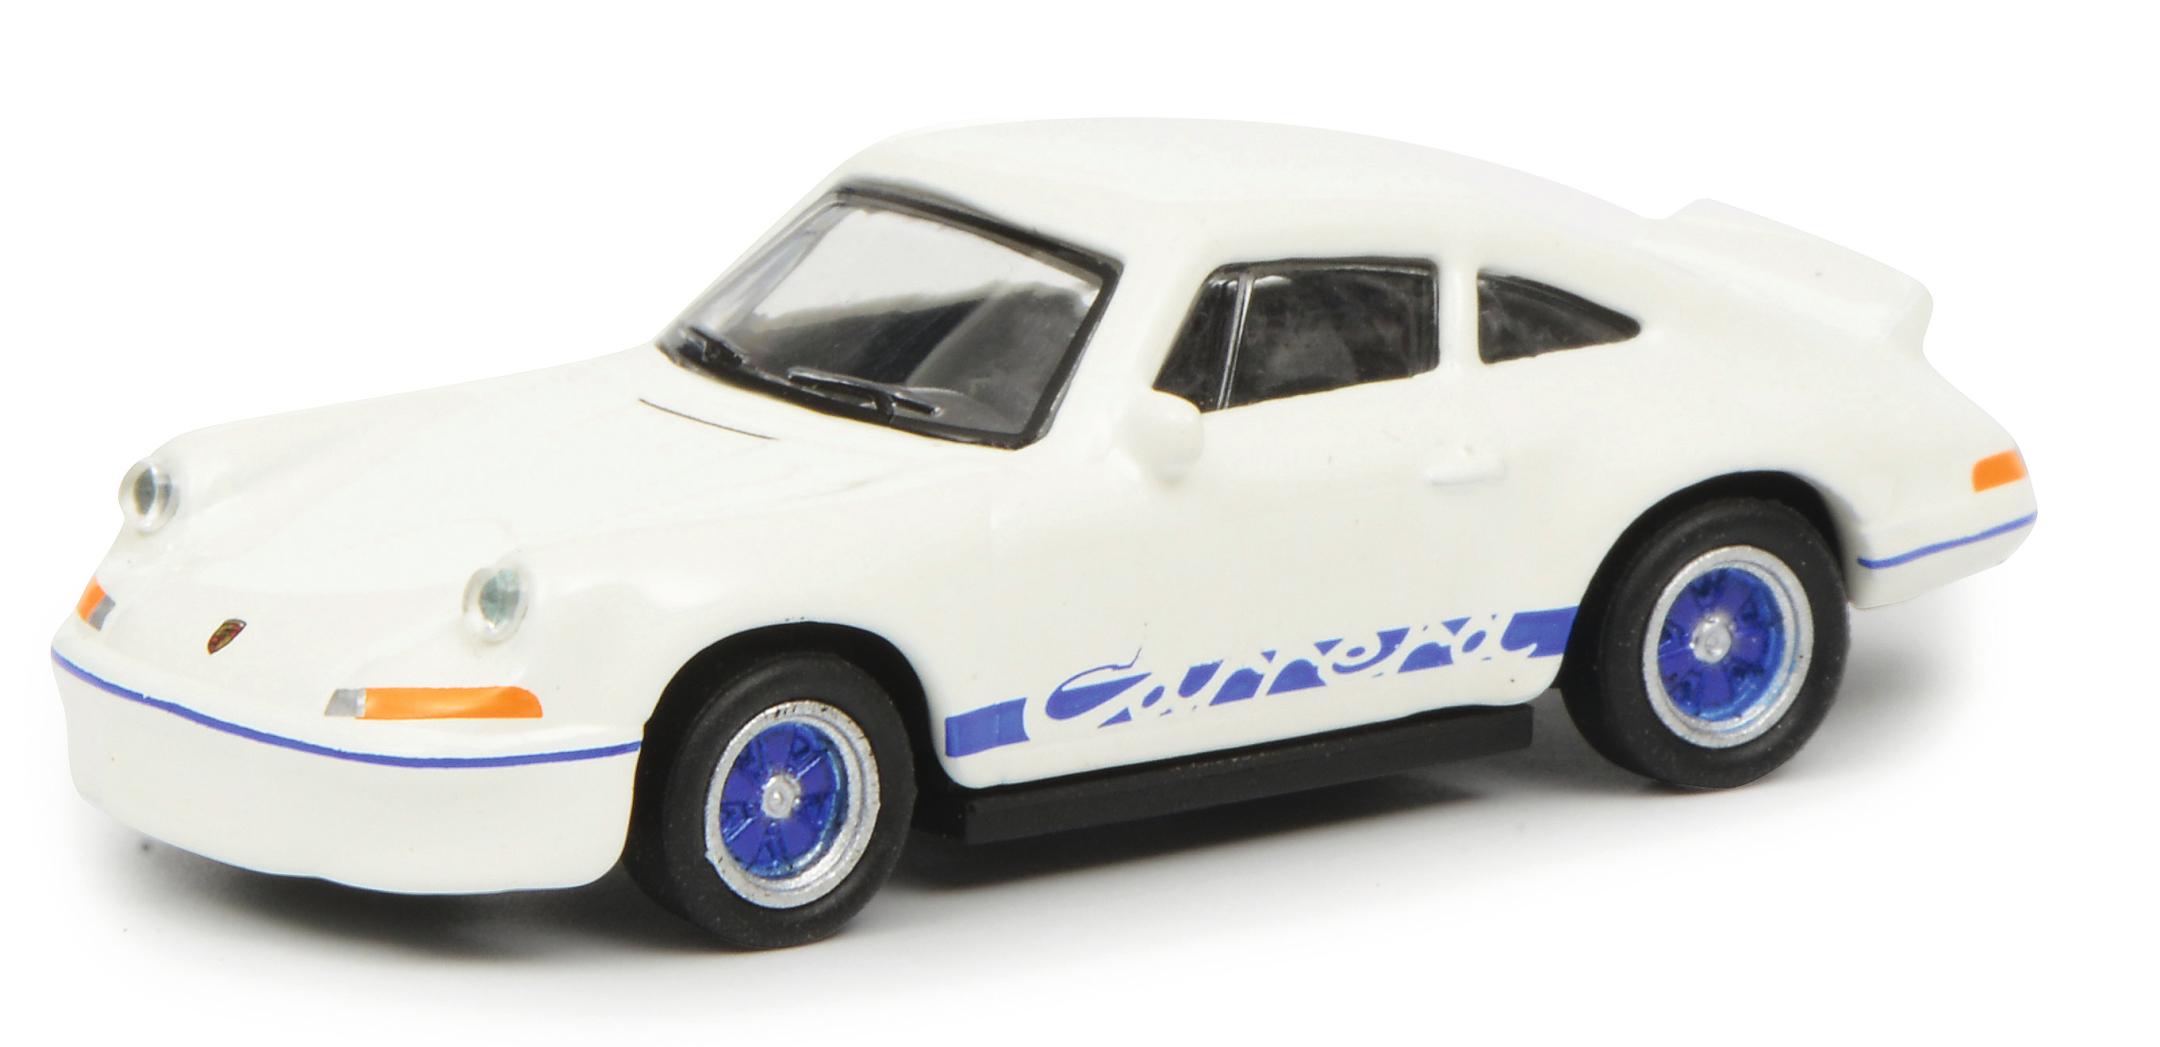 Porsche 911 Carrera RS 2.7 1:87